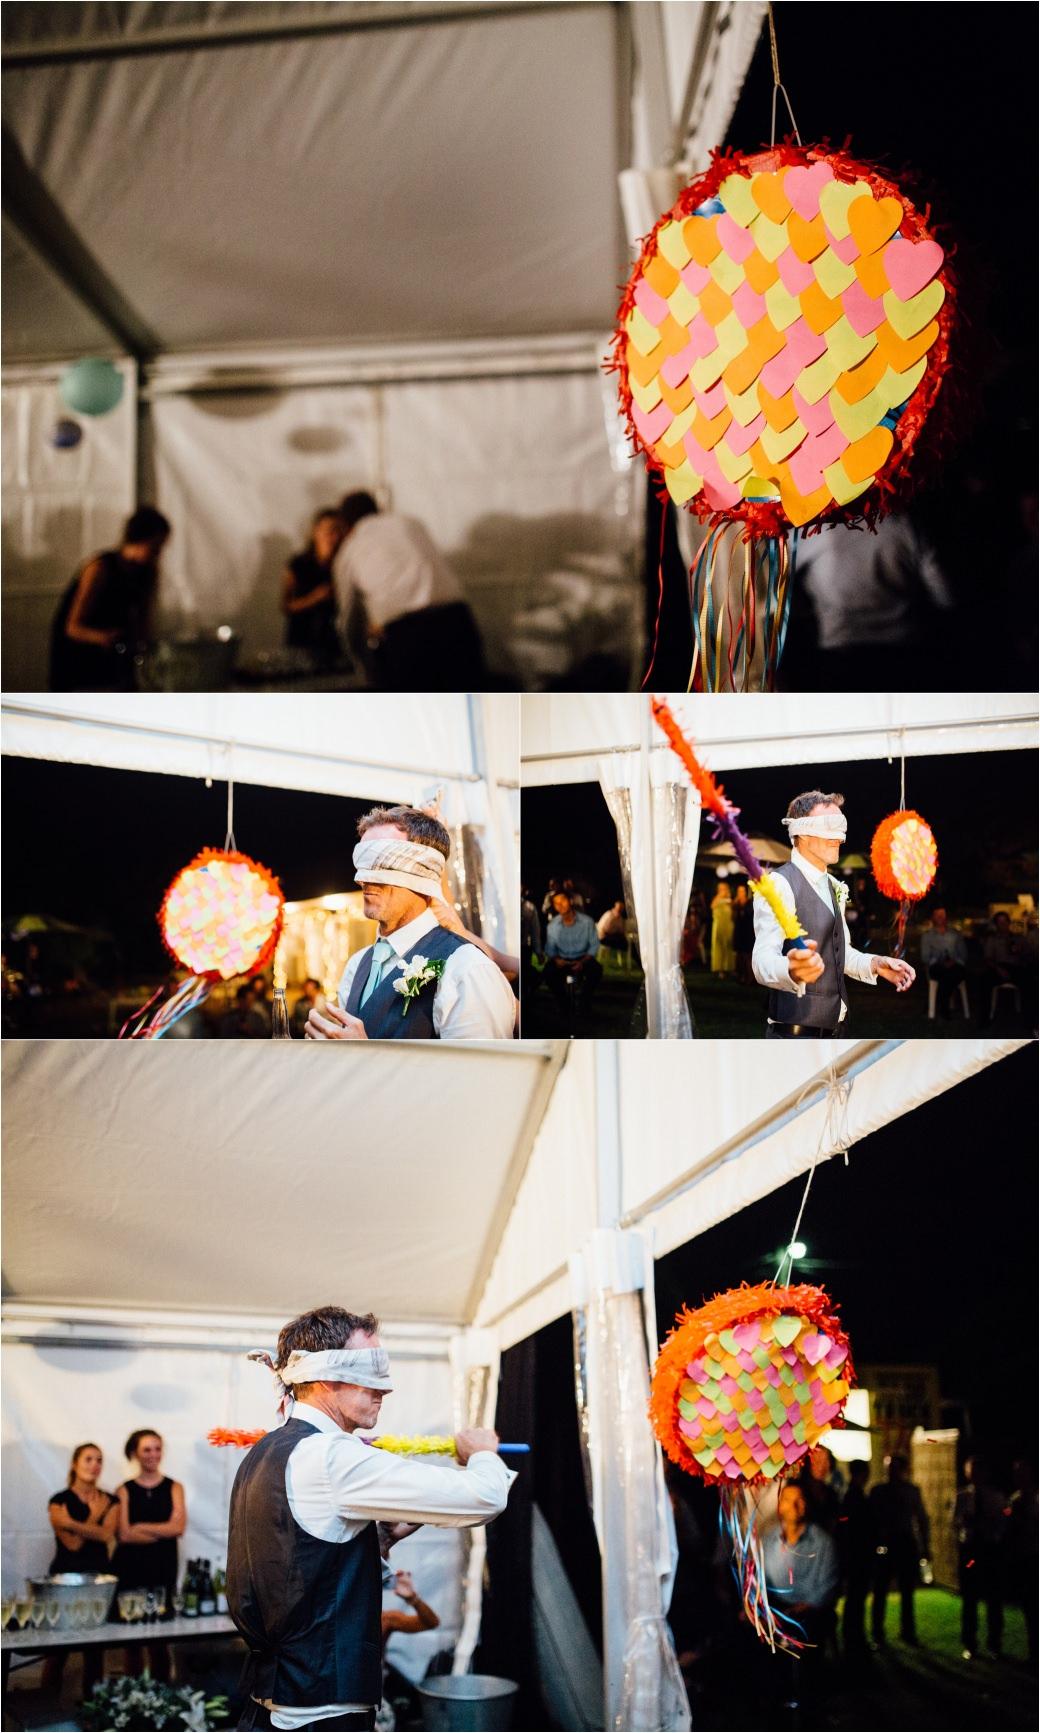 hanwin triathlon taco truck sorrento australian beach witsup wedding day melbourne wedding hyggelig photography089